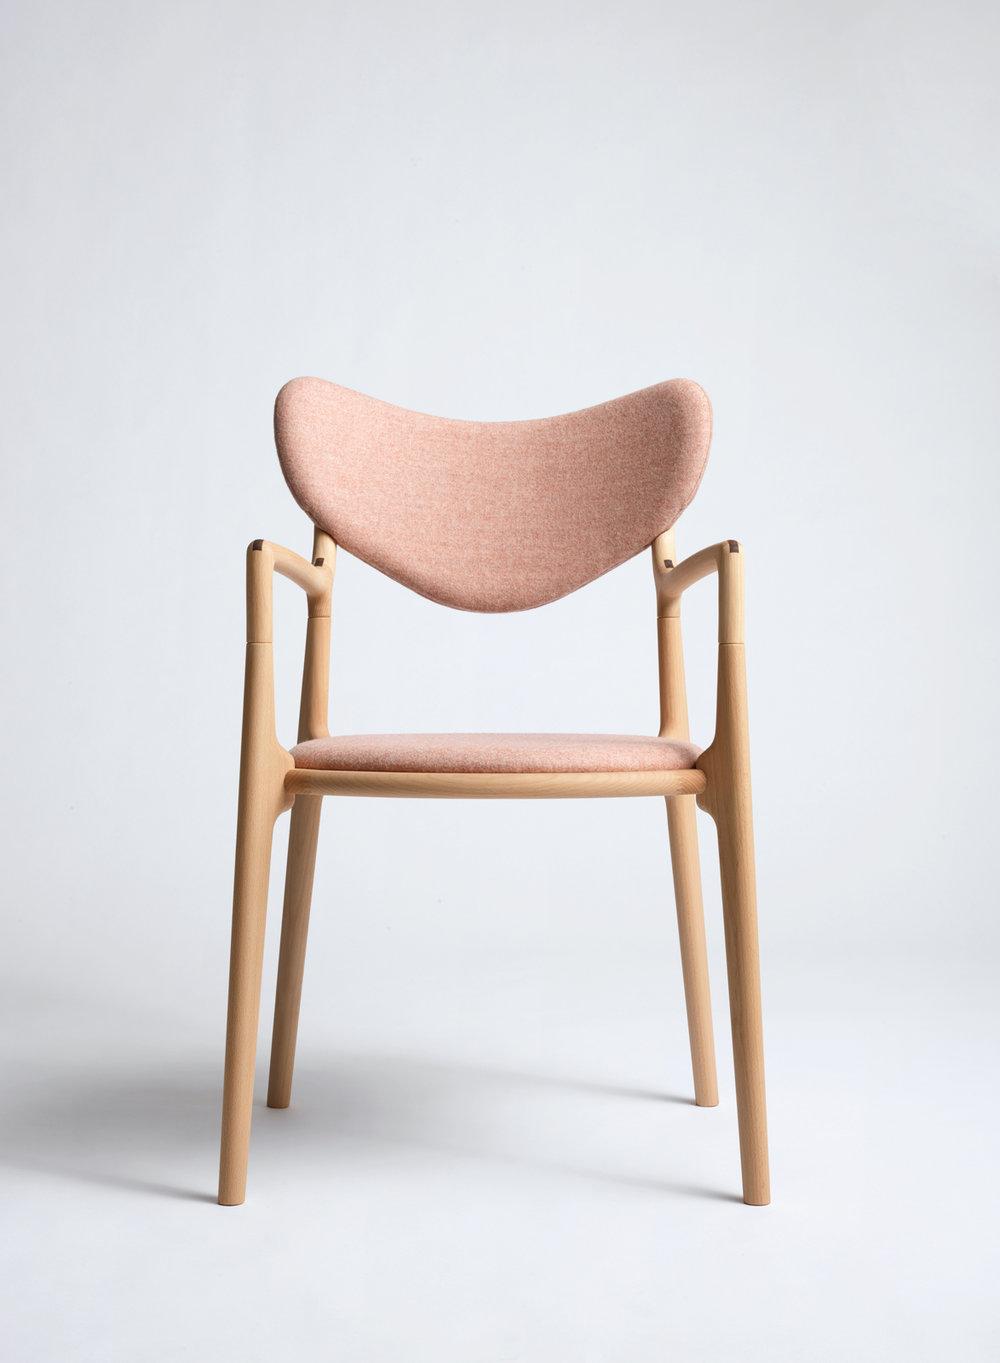 Salon_Chair_Beech_Oil_Camira_Fabric_Asger_Soelberg_06.jpg